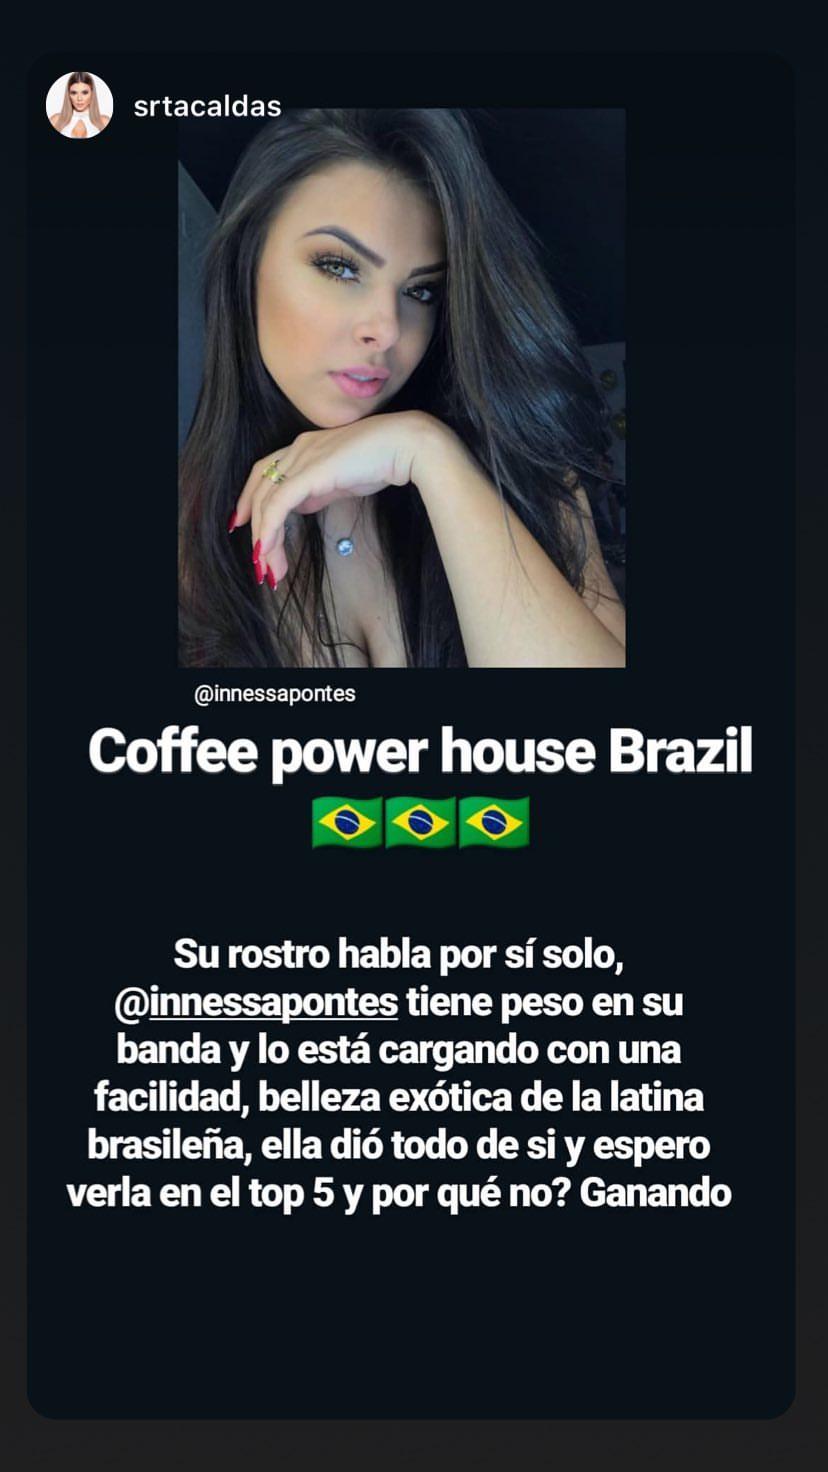 innessa pontes, quinta colocada de reynado internacional cafe 2019. - Página 13 49993810